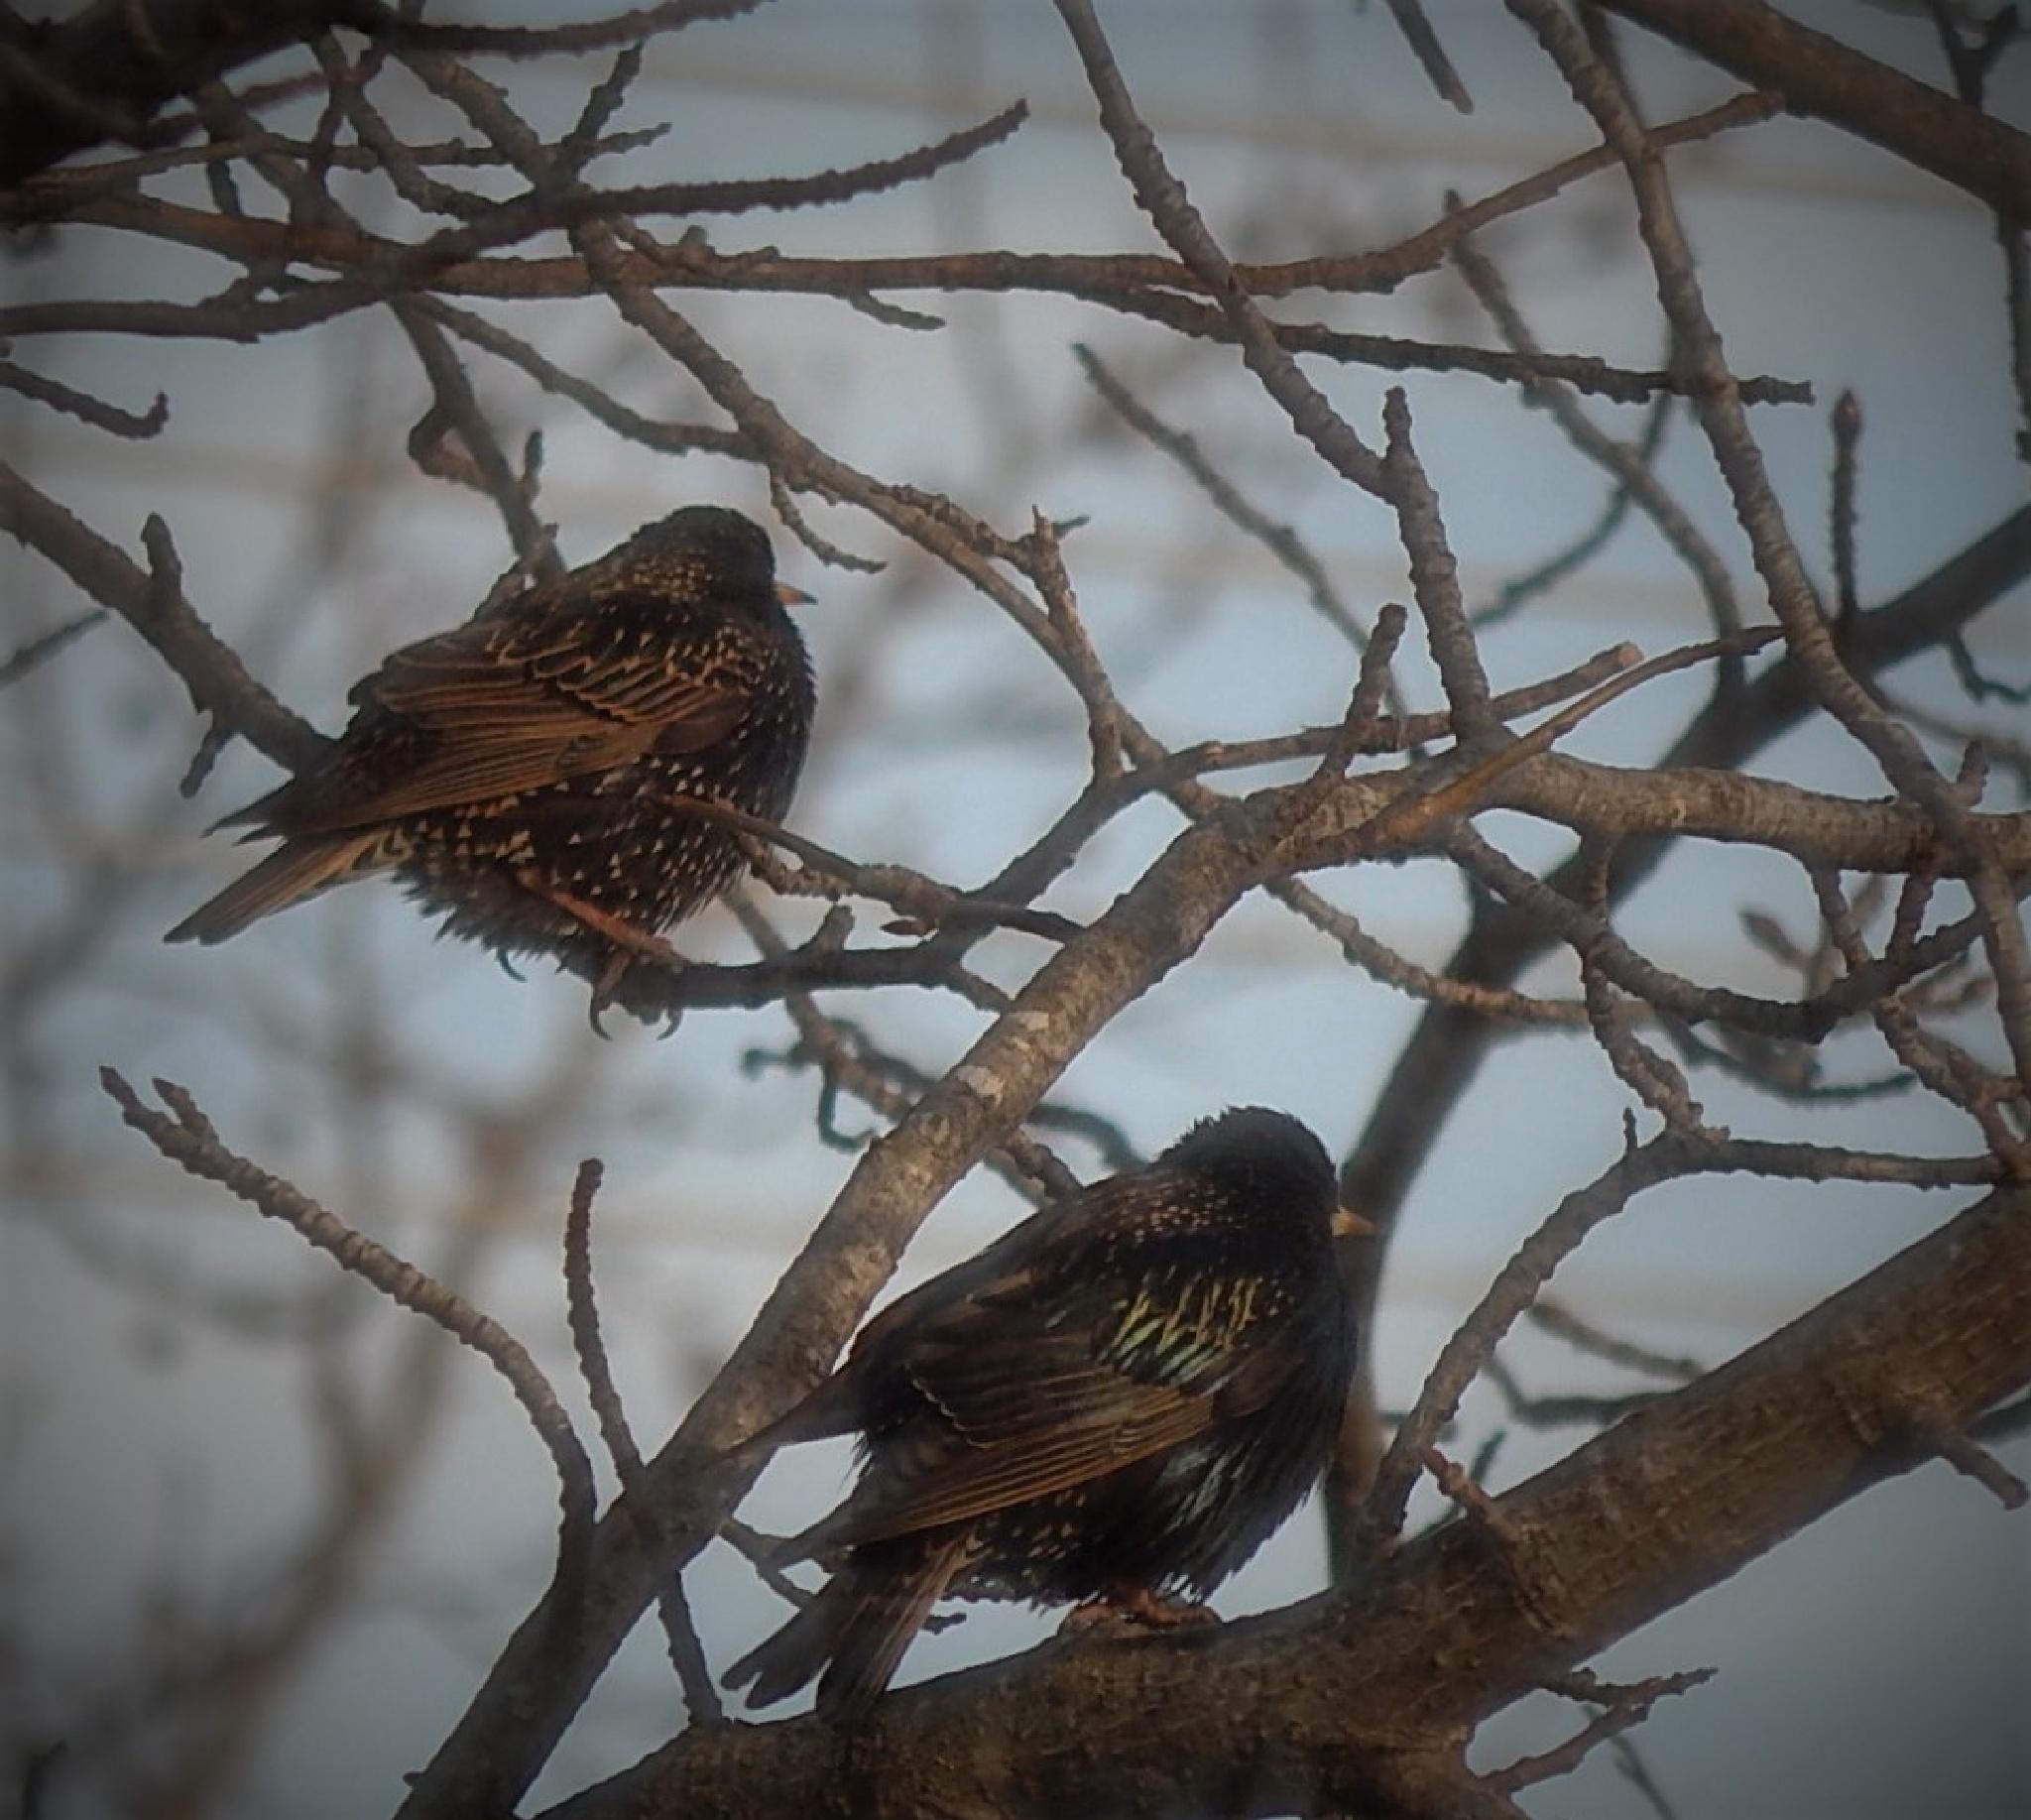 Chillin birds by Marsha Furman